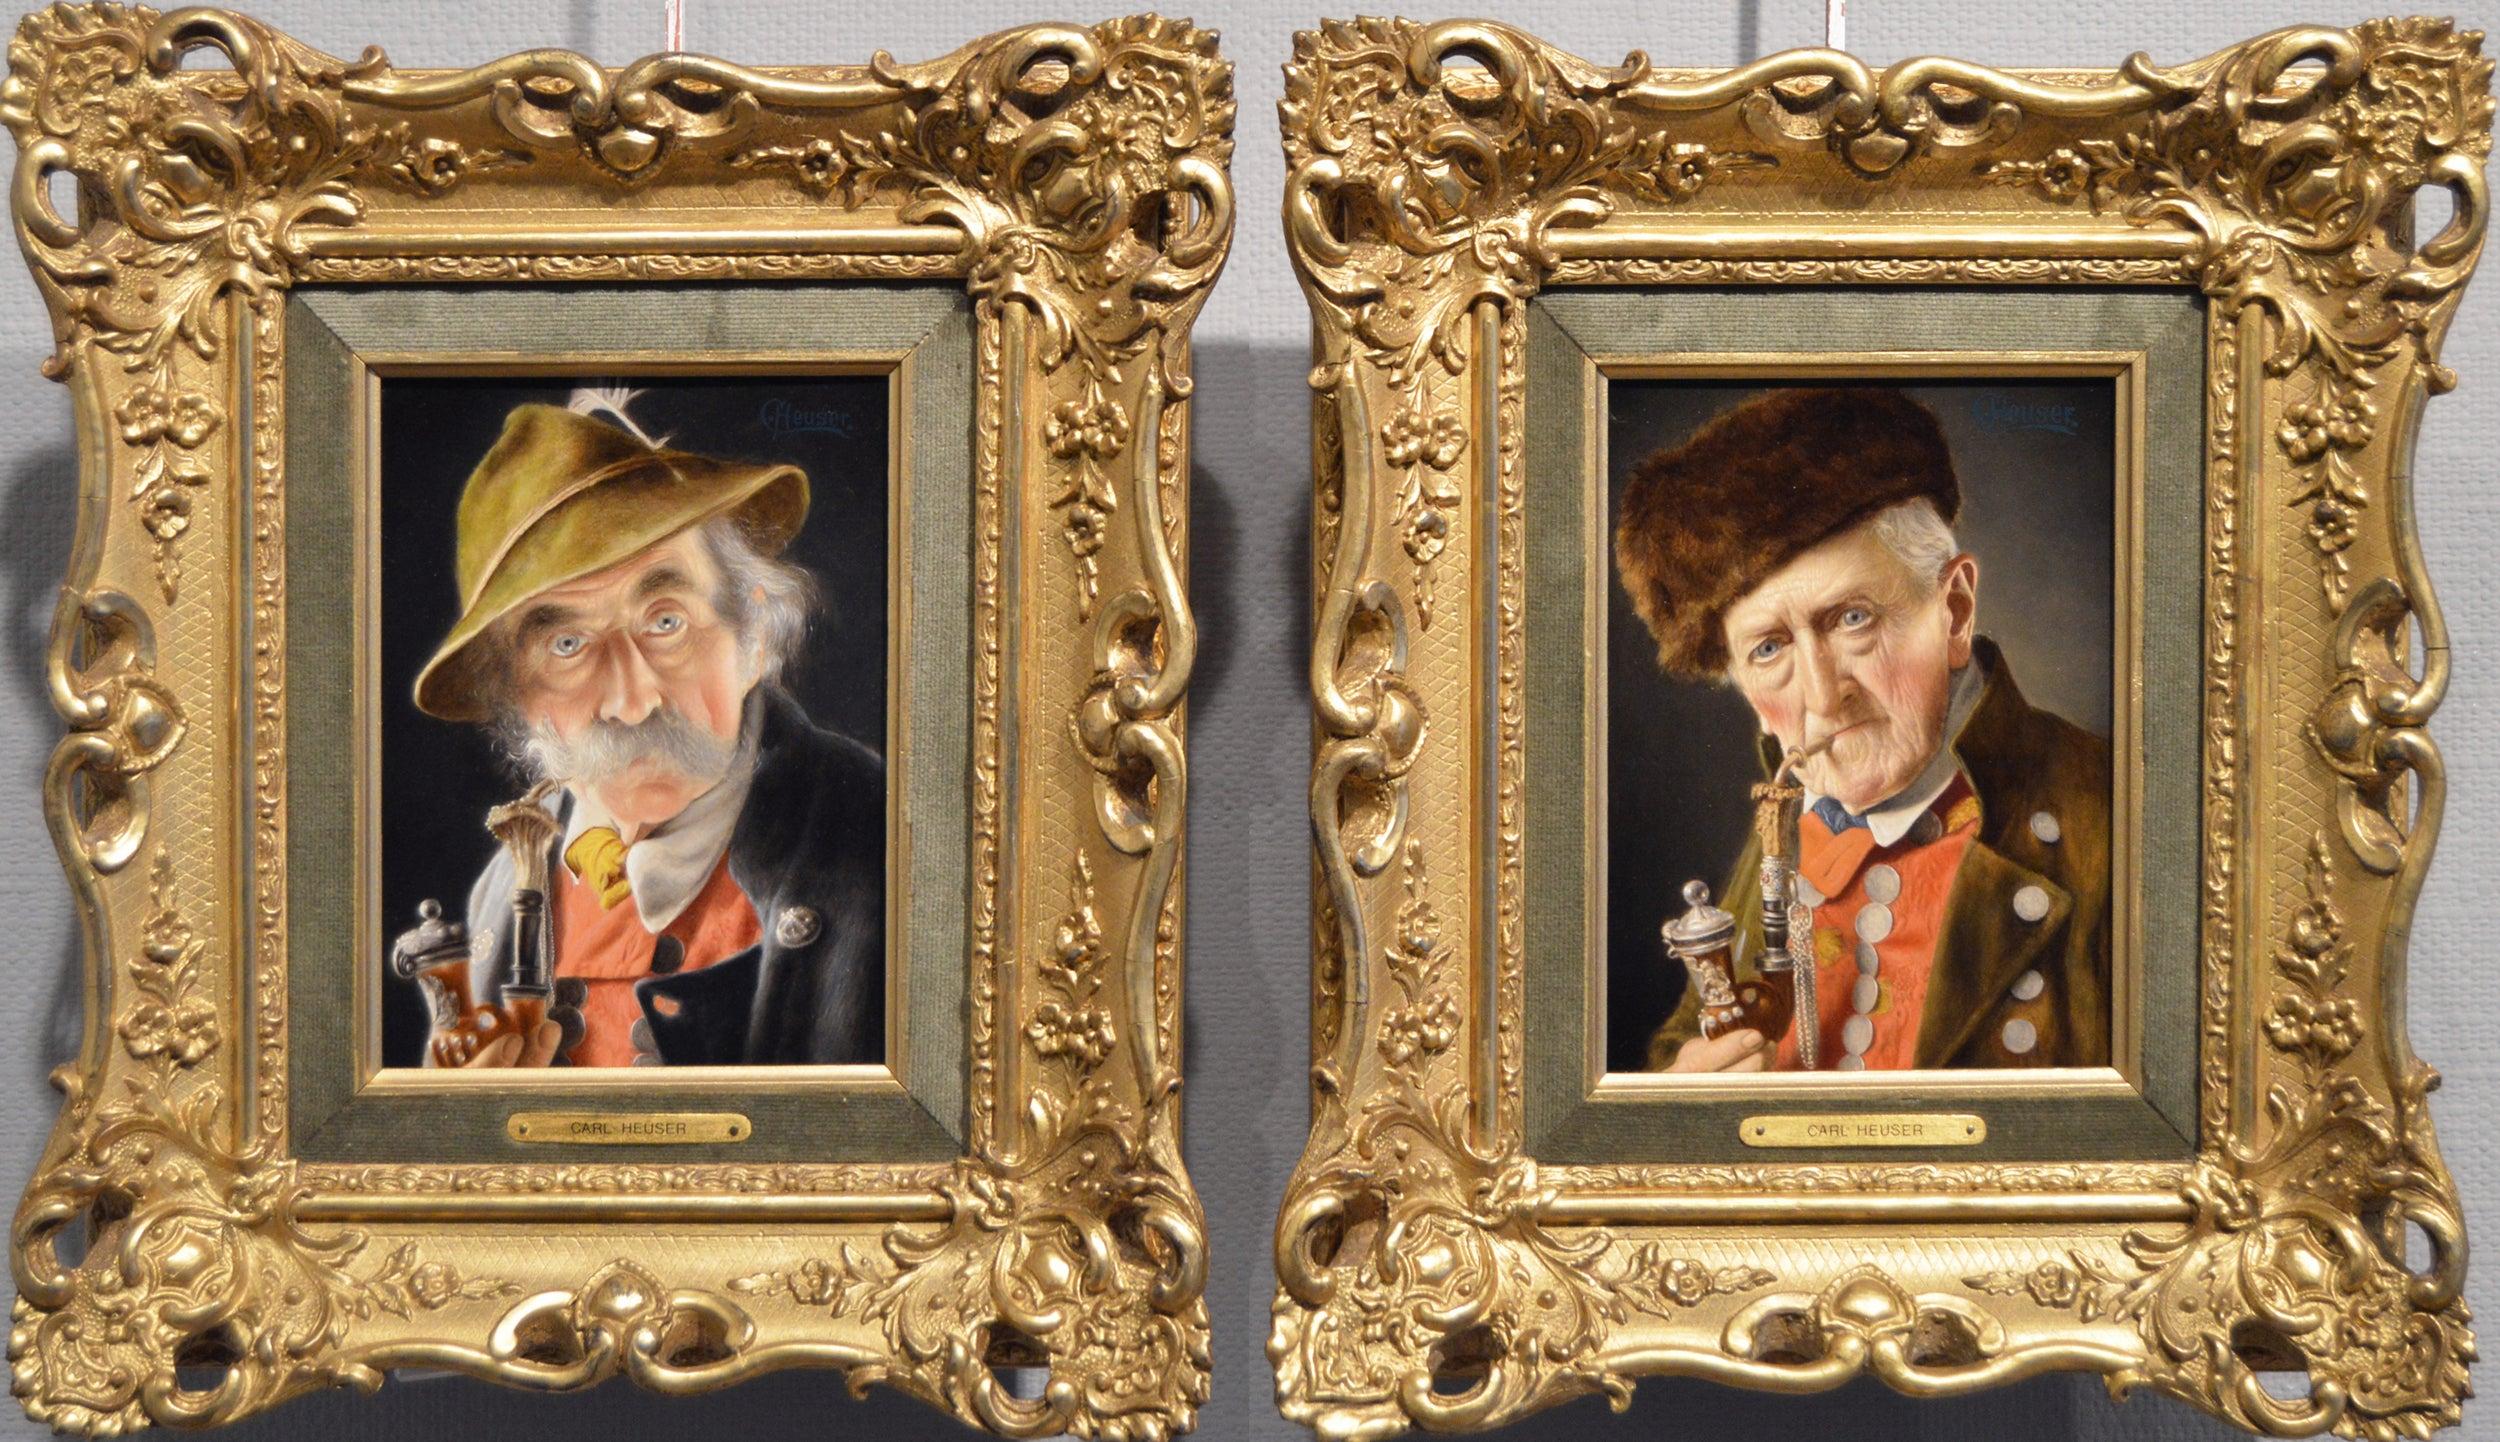 19th Century pair of oil painting portraits of Bavarian Gentlemen